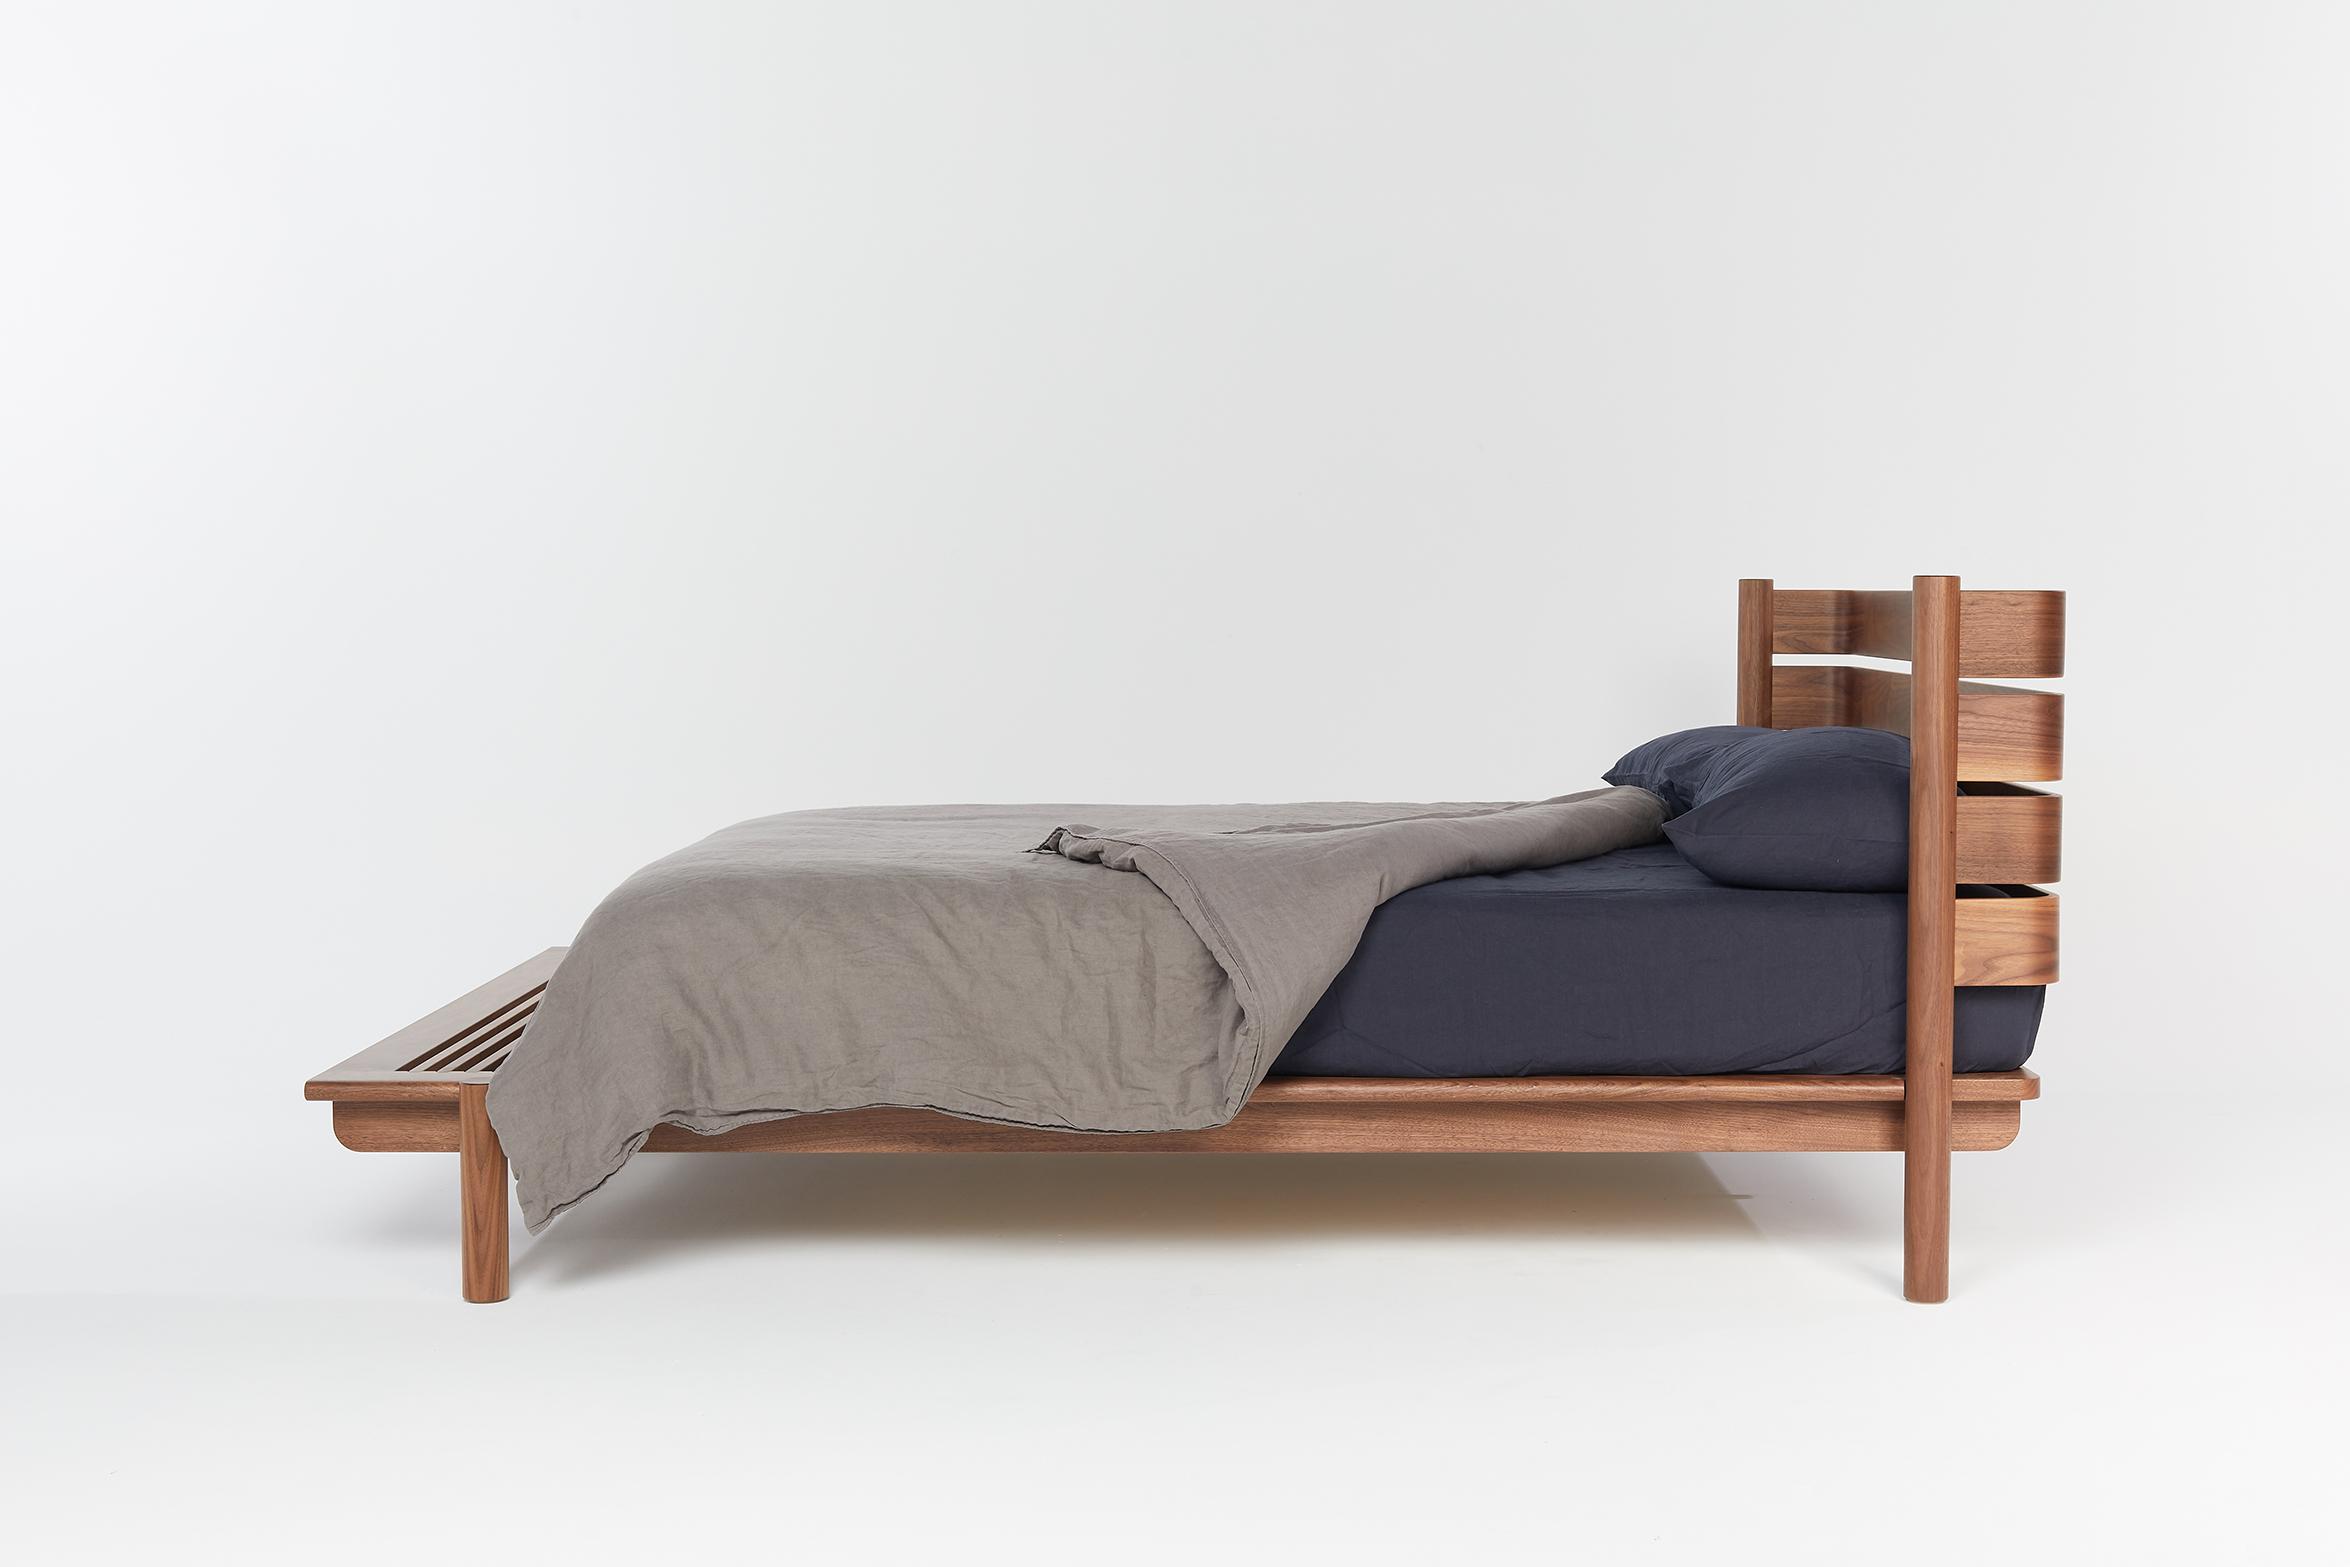 Title Bed 04 by Mast Furniture. Modern, handmade furniture.